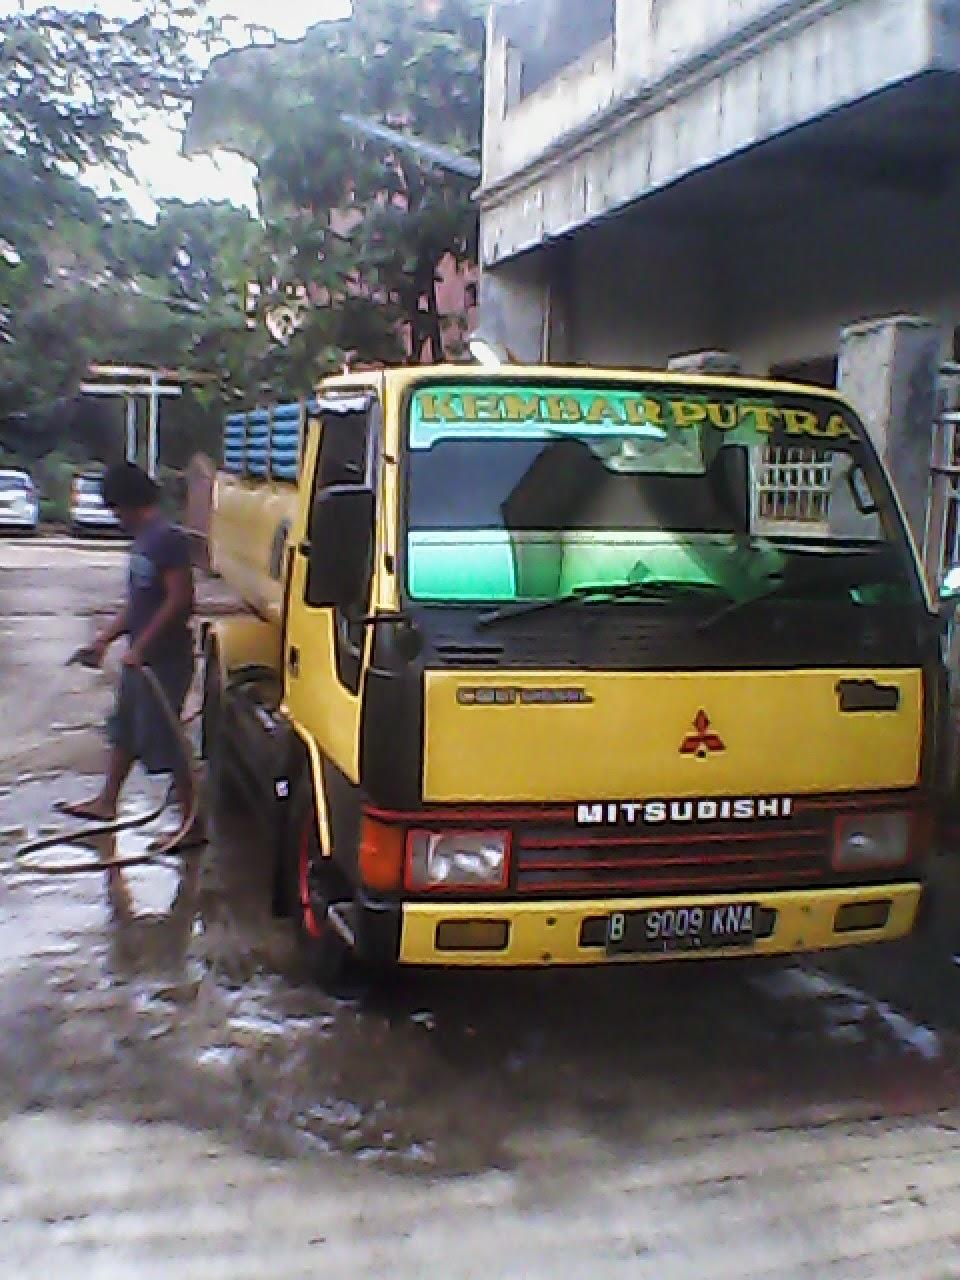 http://jakarta-utara-sedotwc.blogspot.co.id/